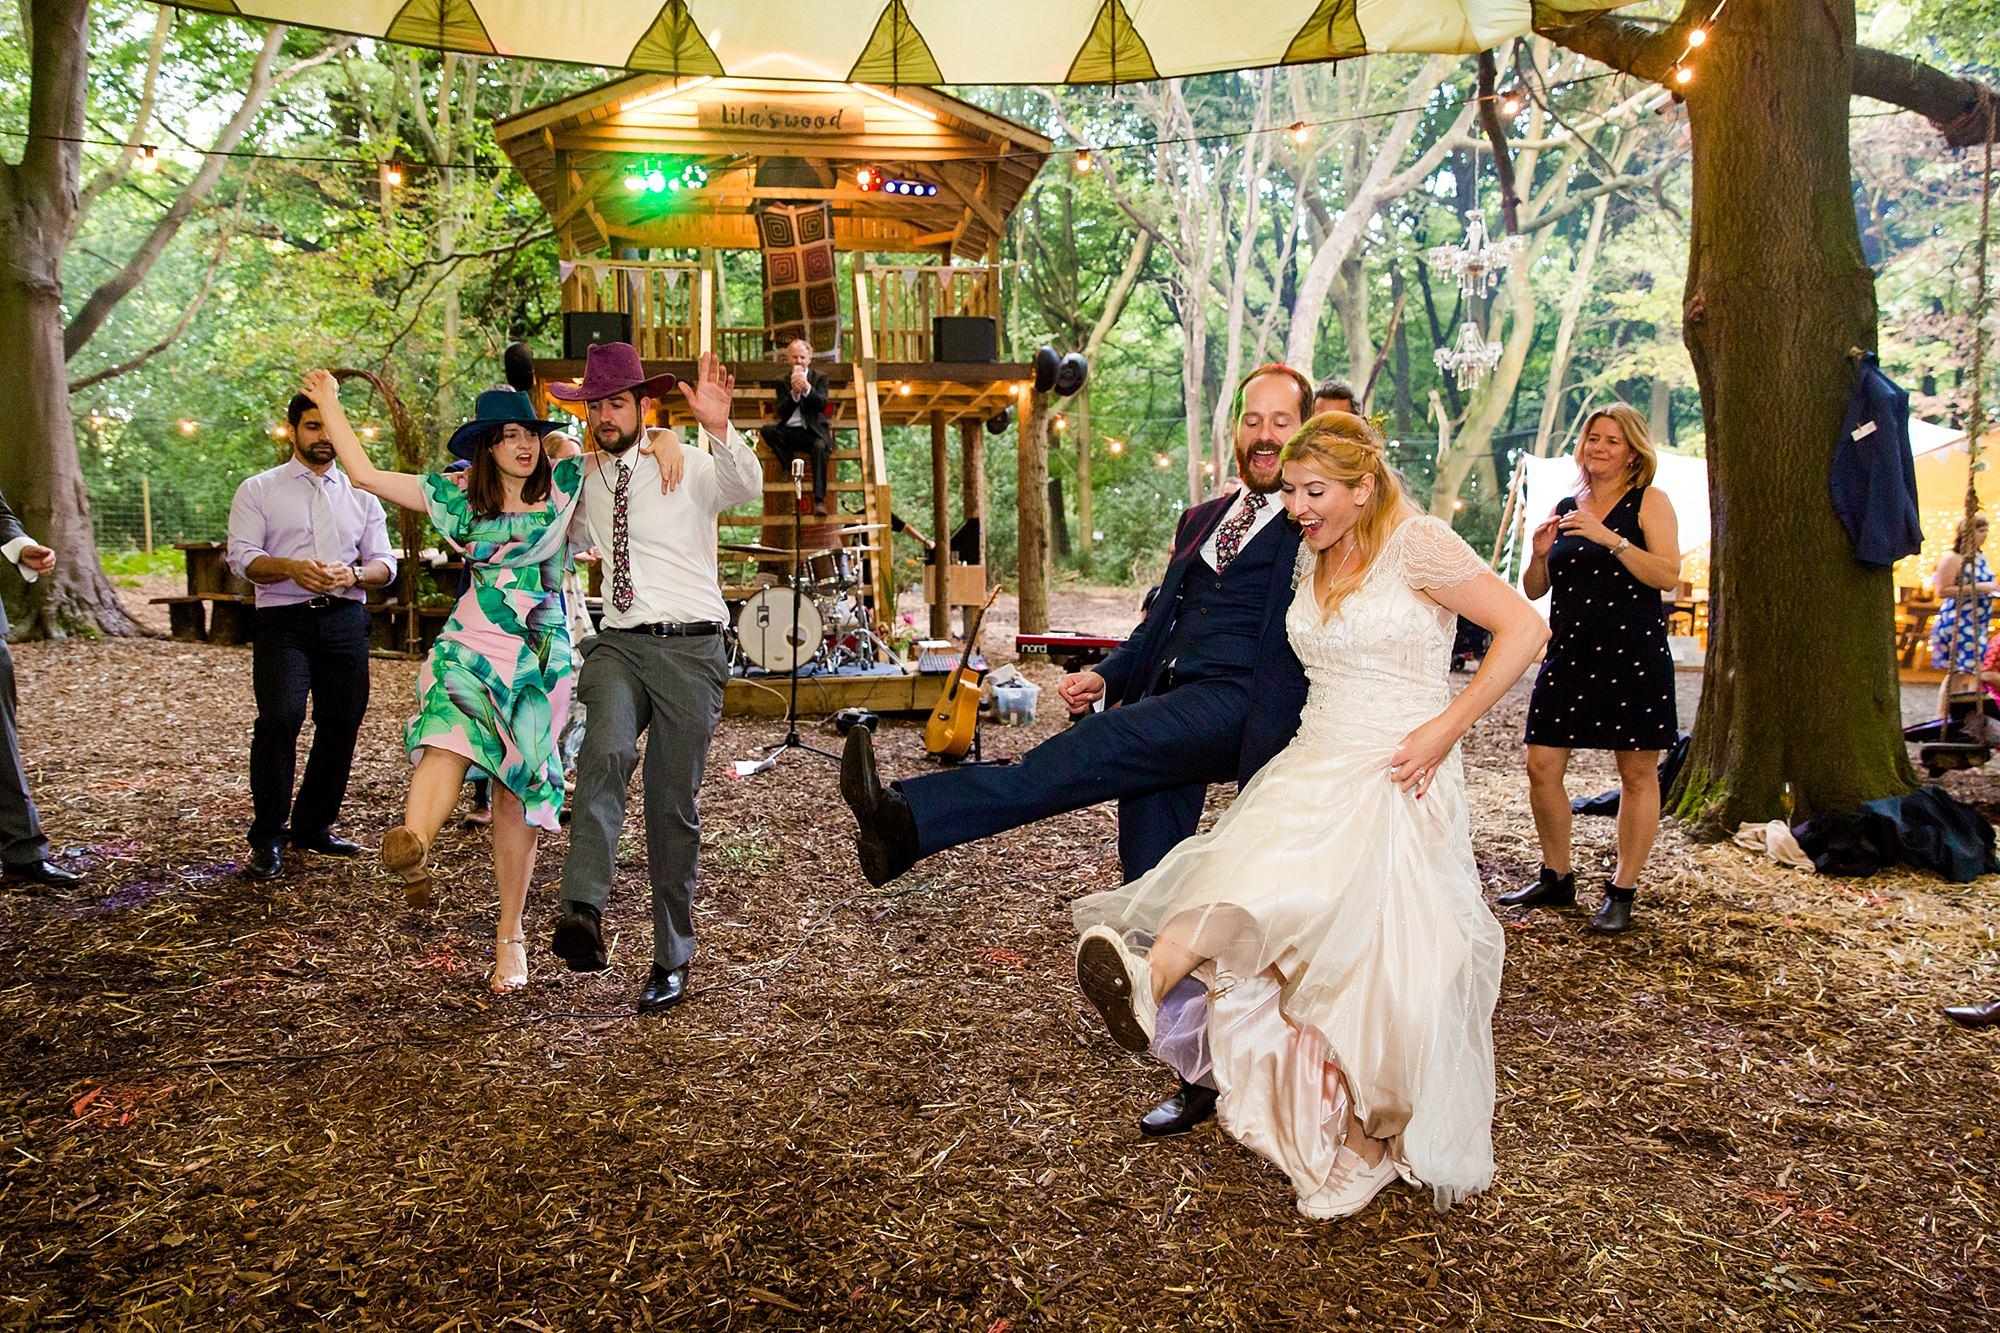 Woodland Weddings Tring swing wedding dancing